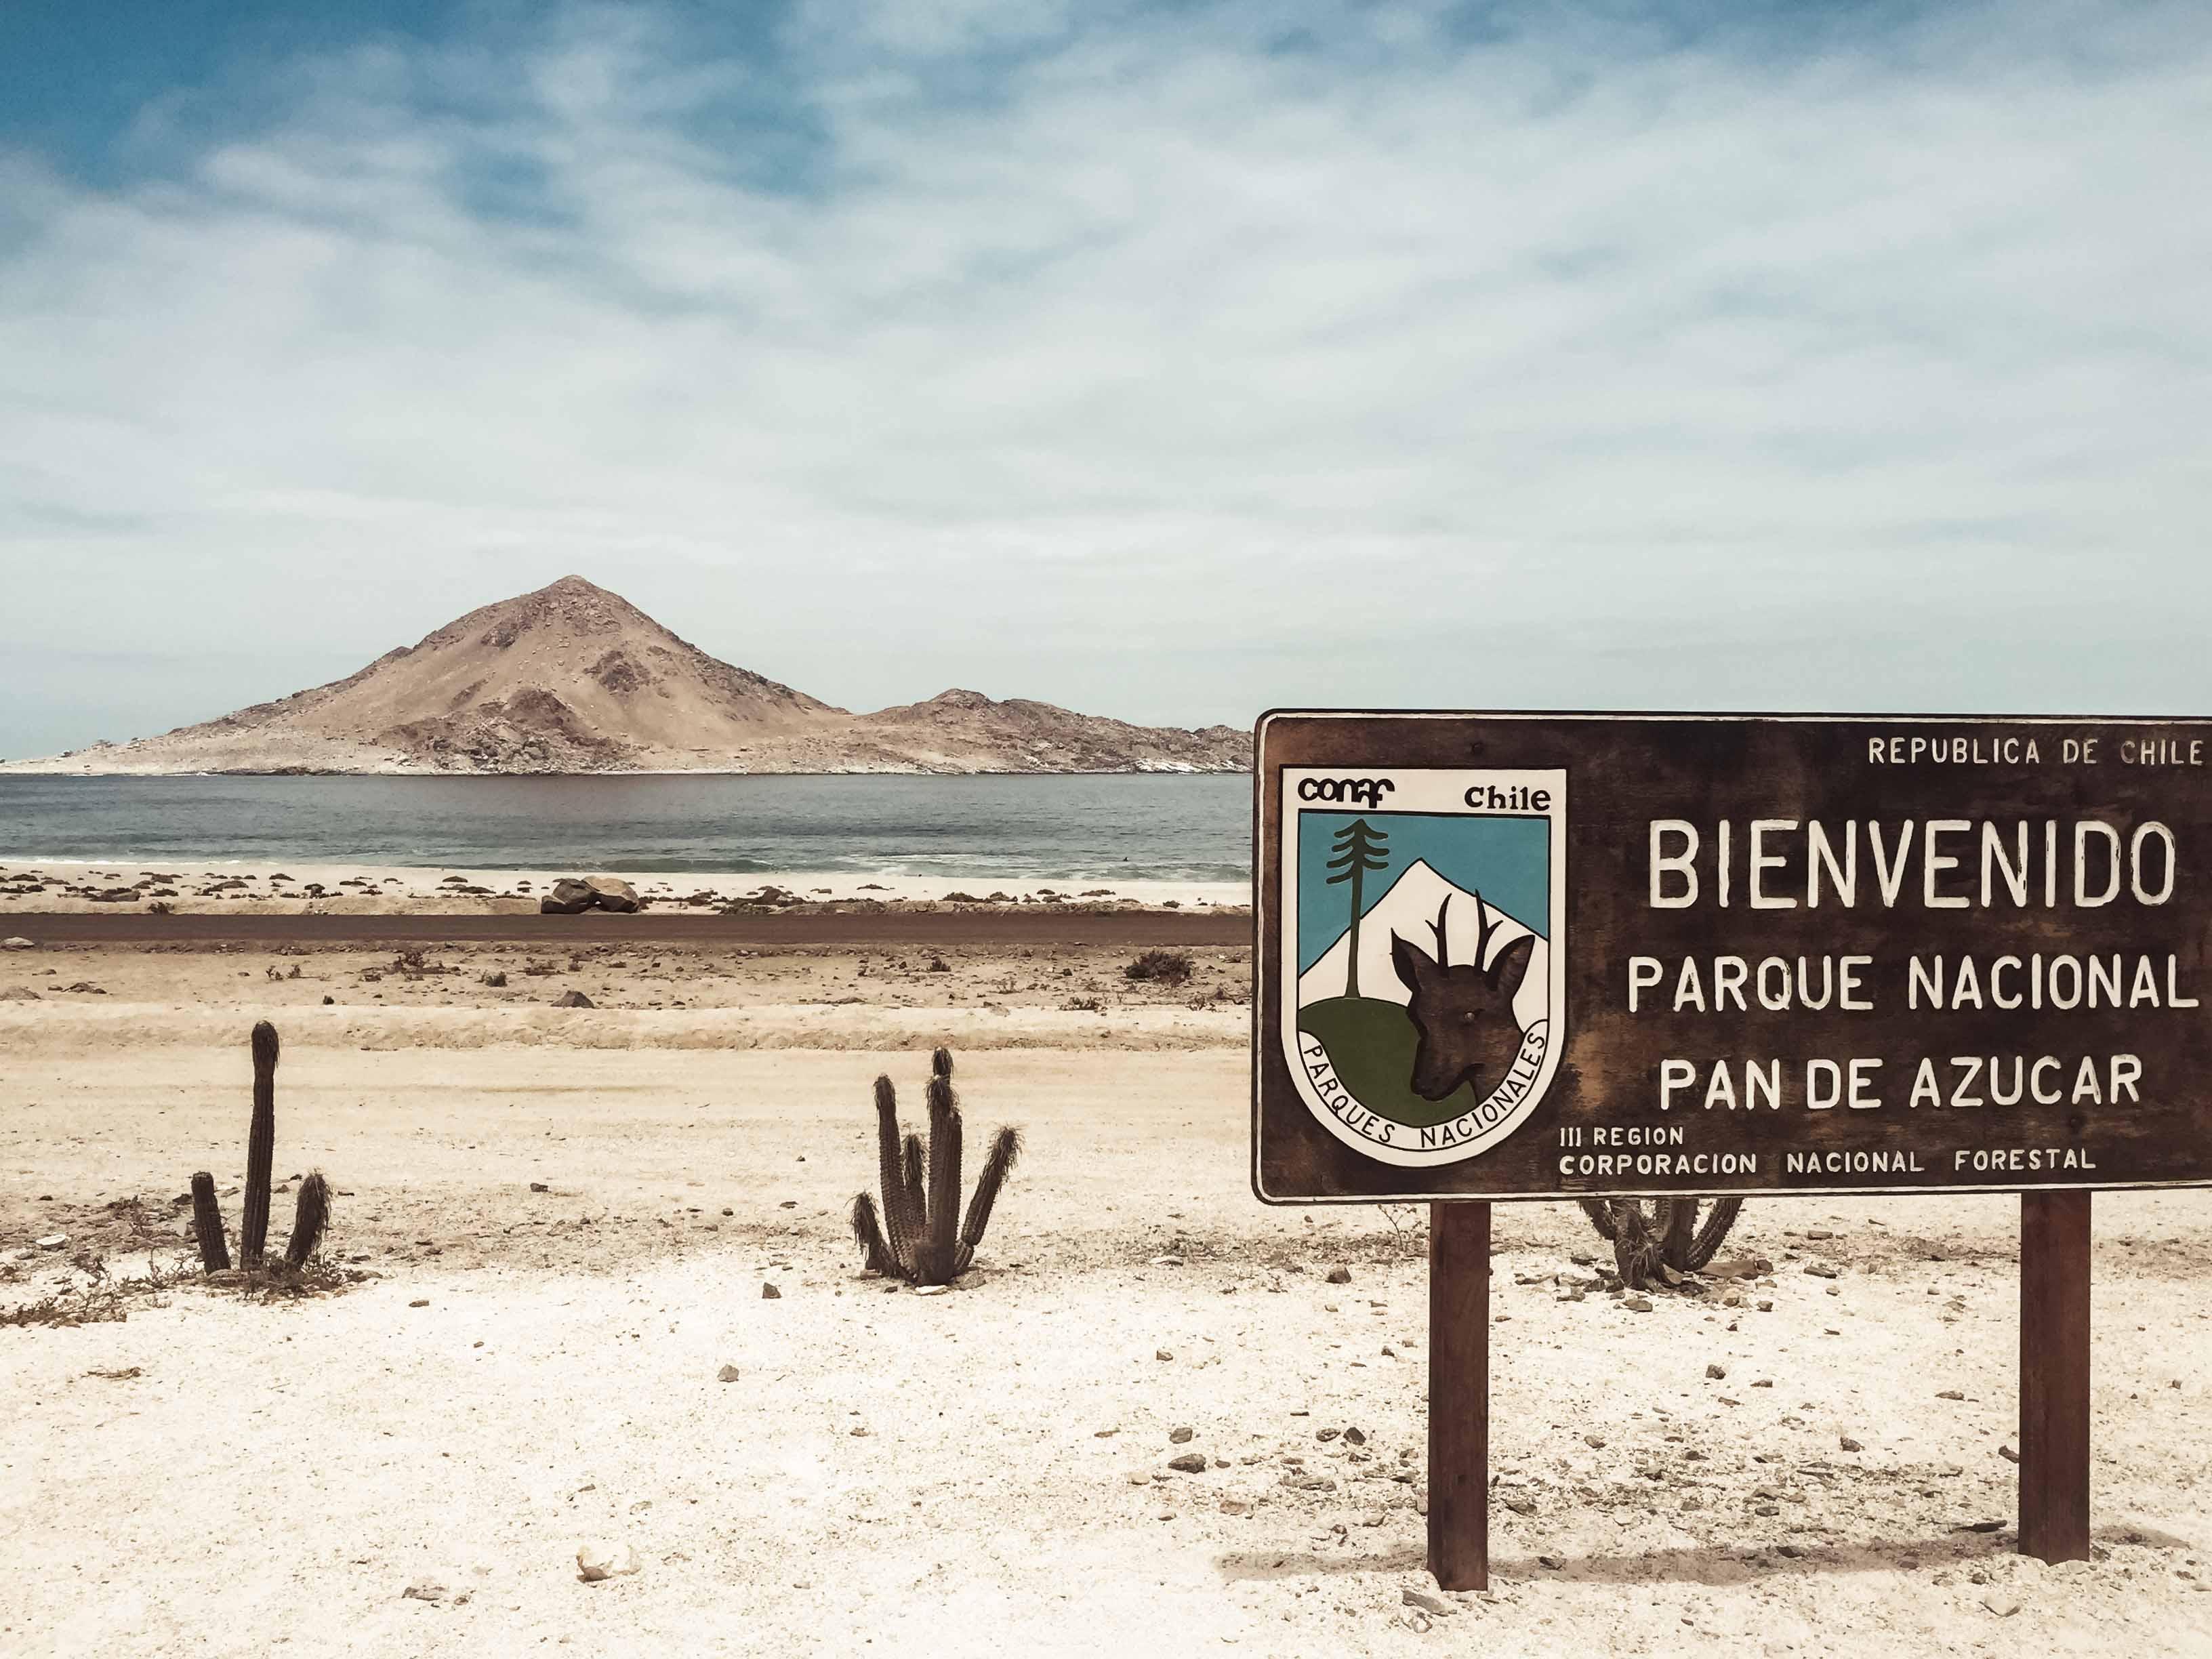 Bienvenidos_a_parque_nacional_pan_de_azu